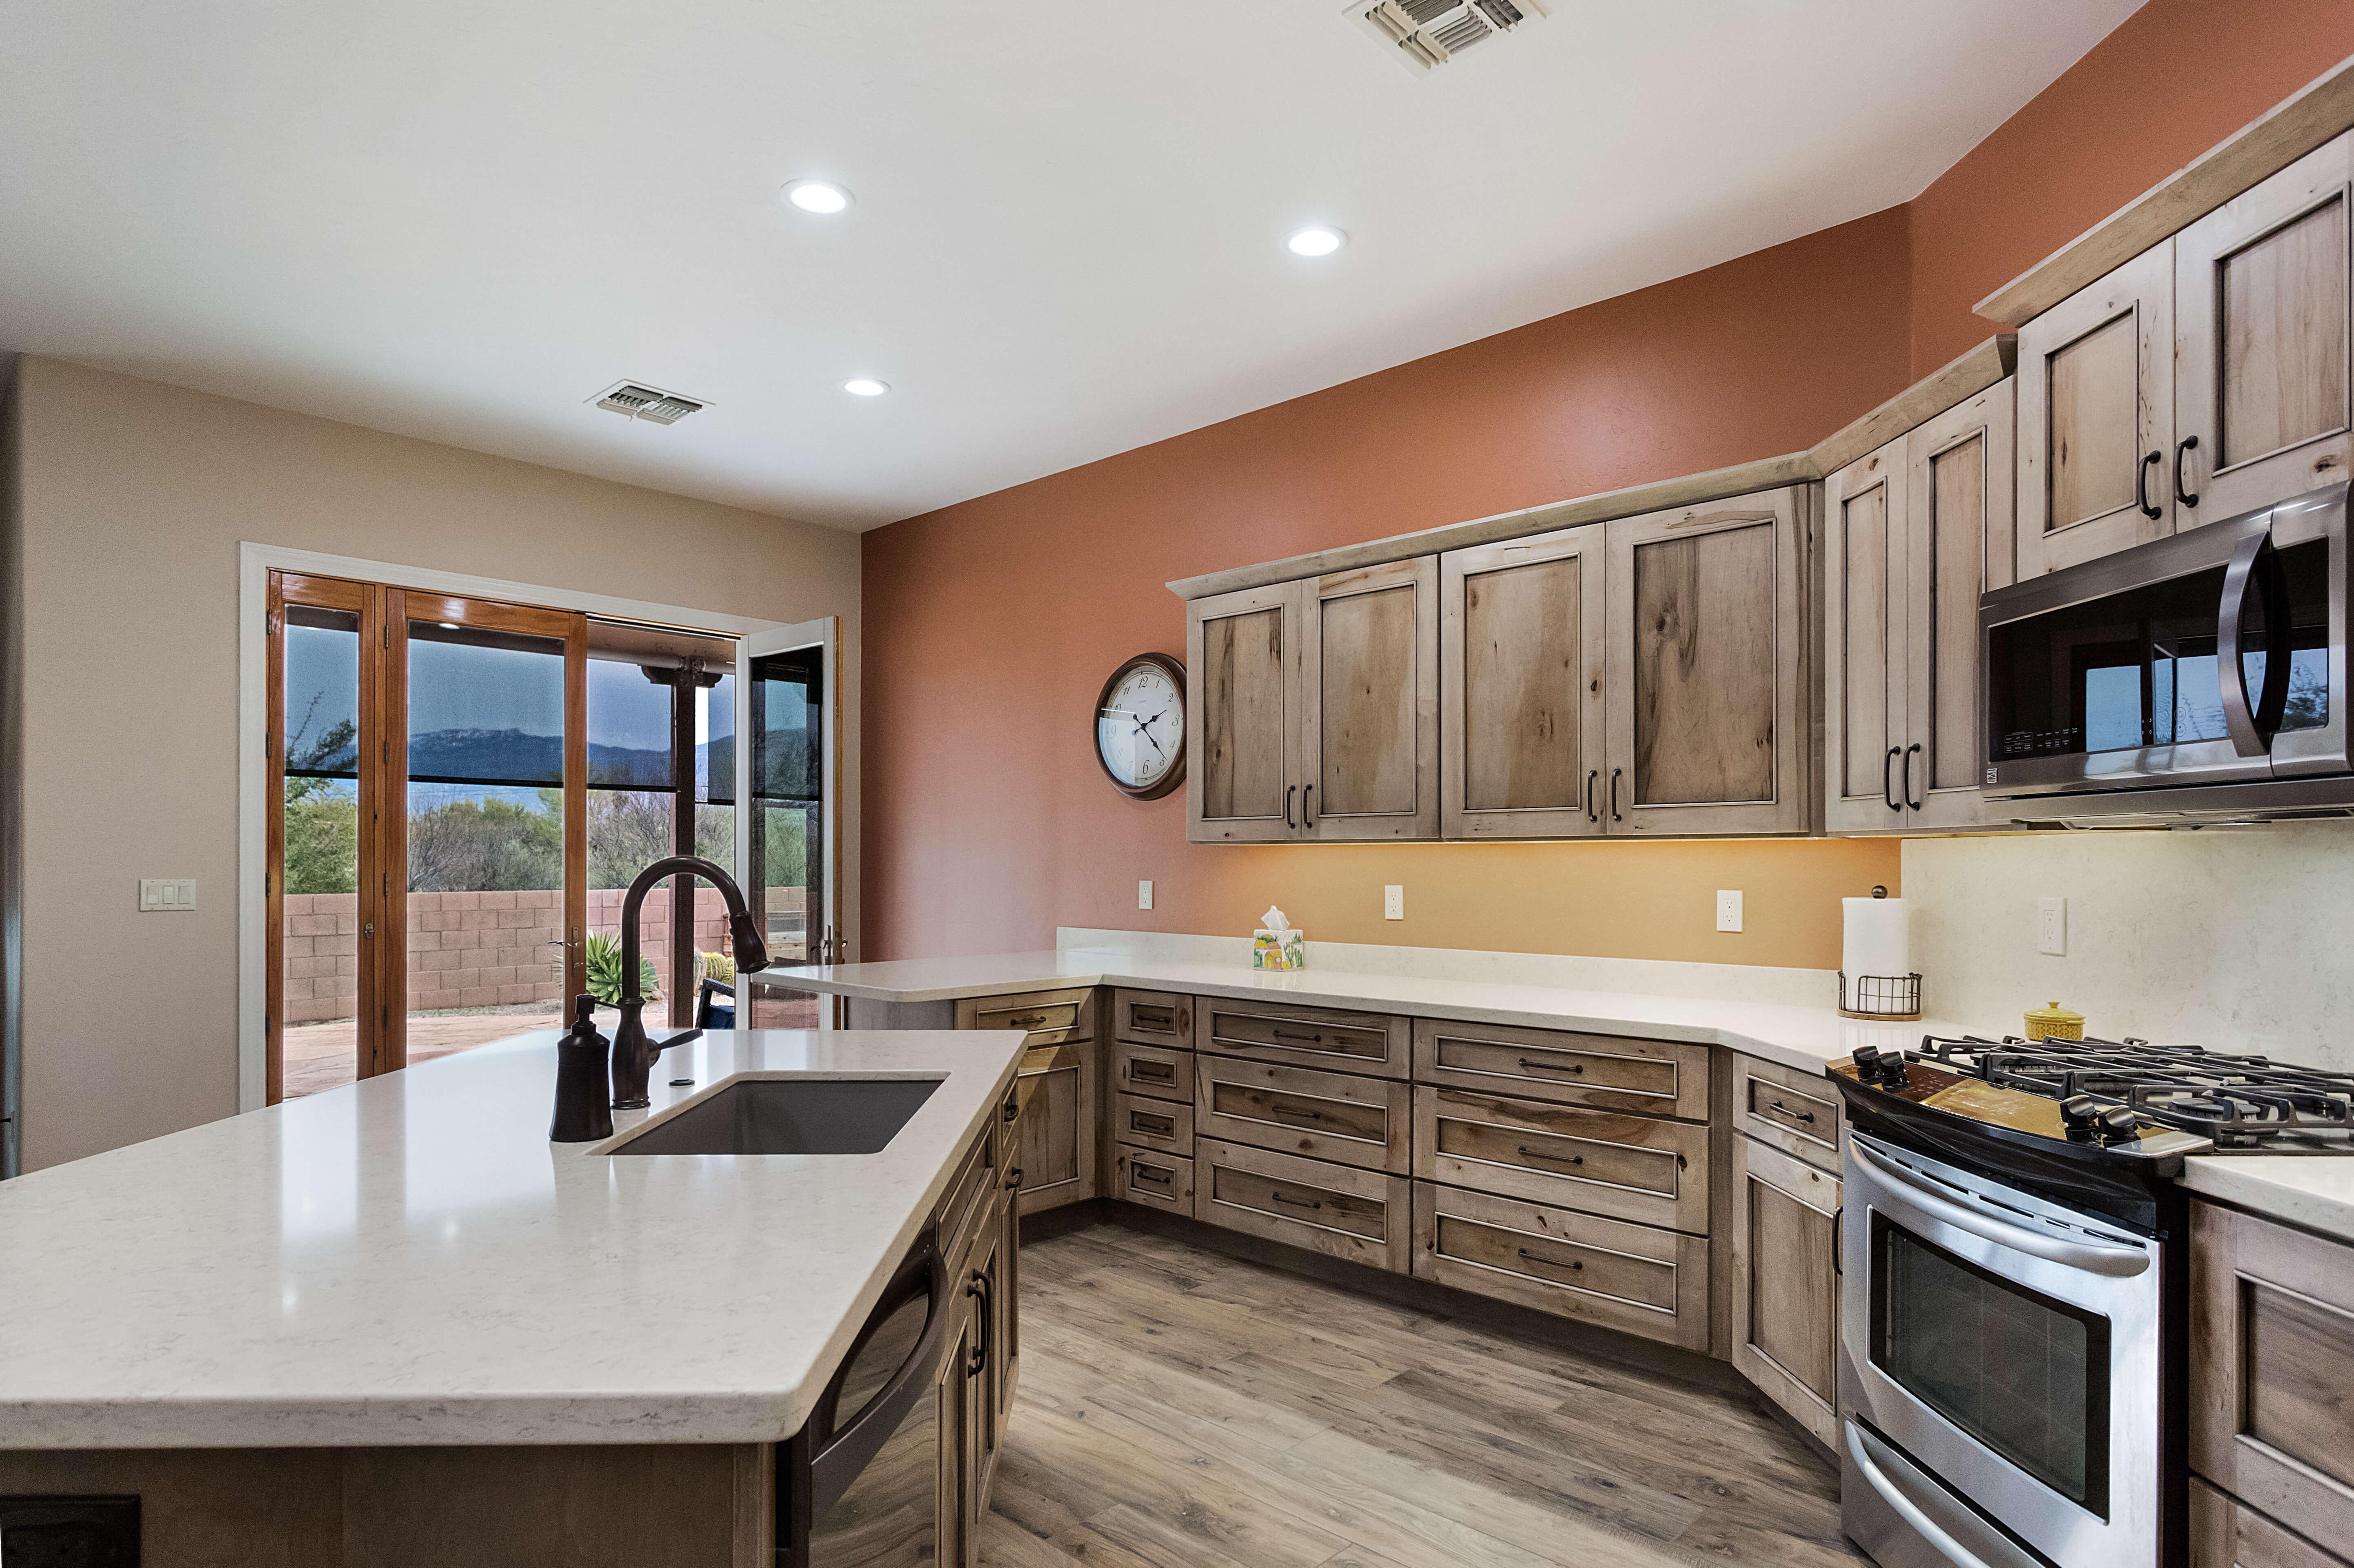 Tucson Kitchen Remodel Designer Maria Jean - Southwest Kitchen